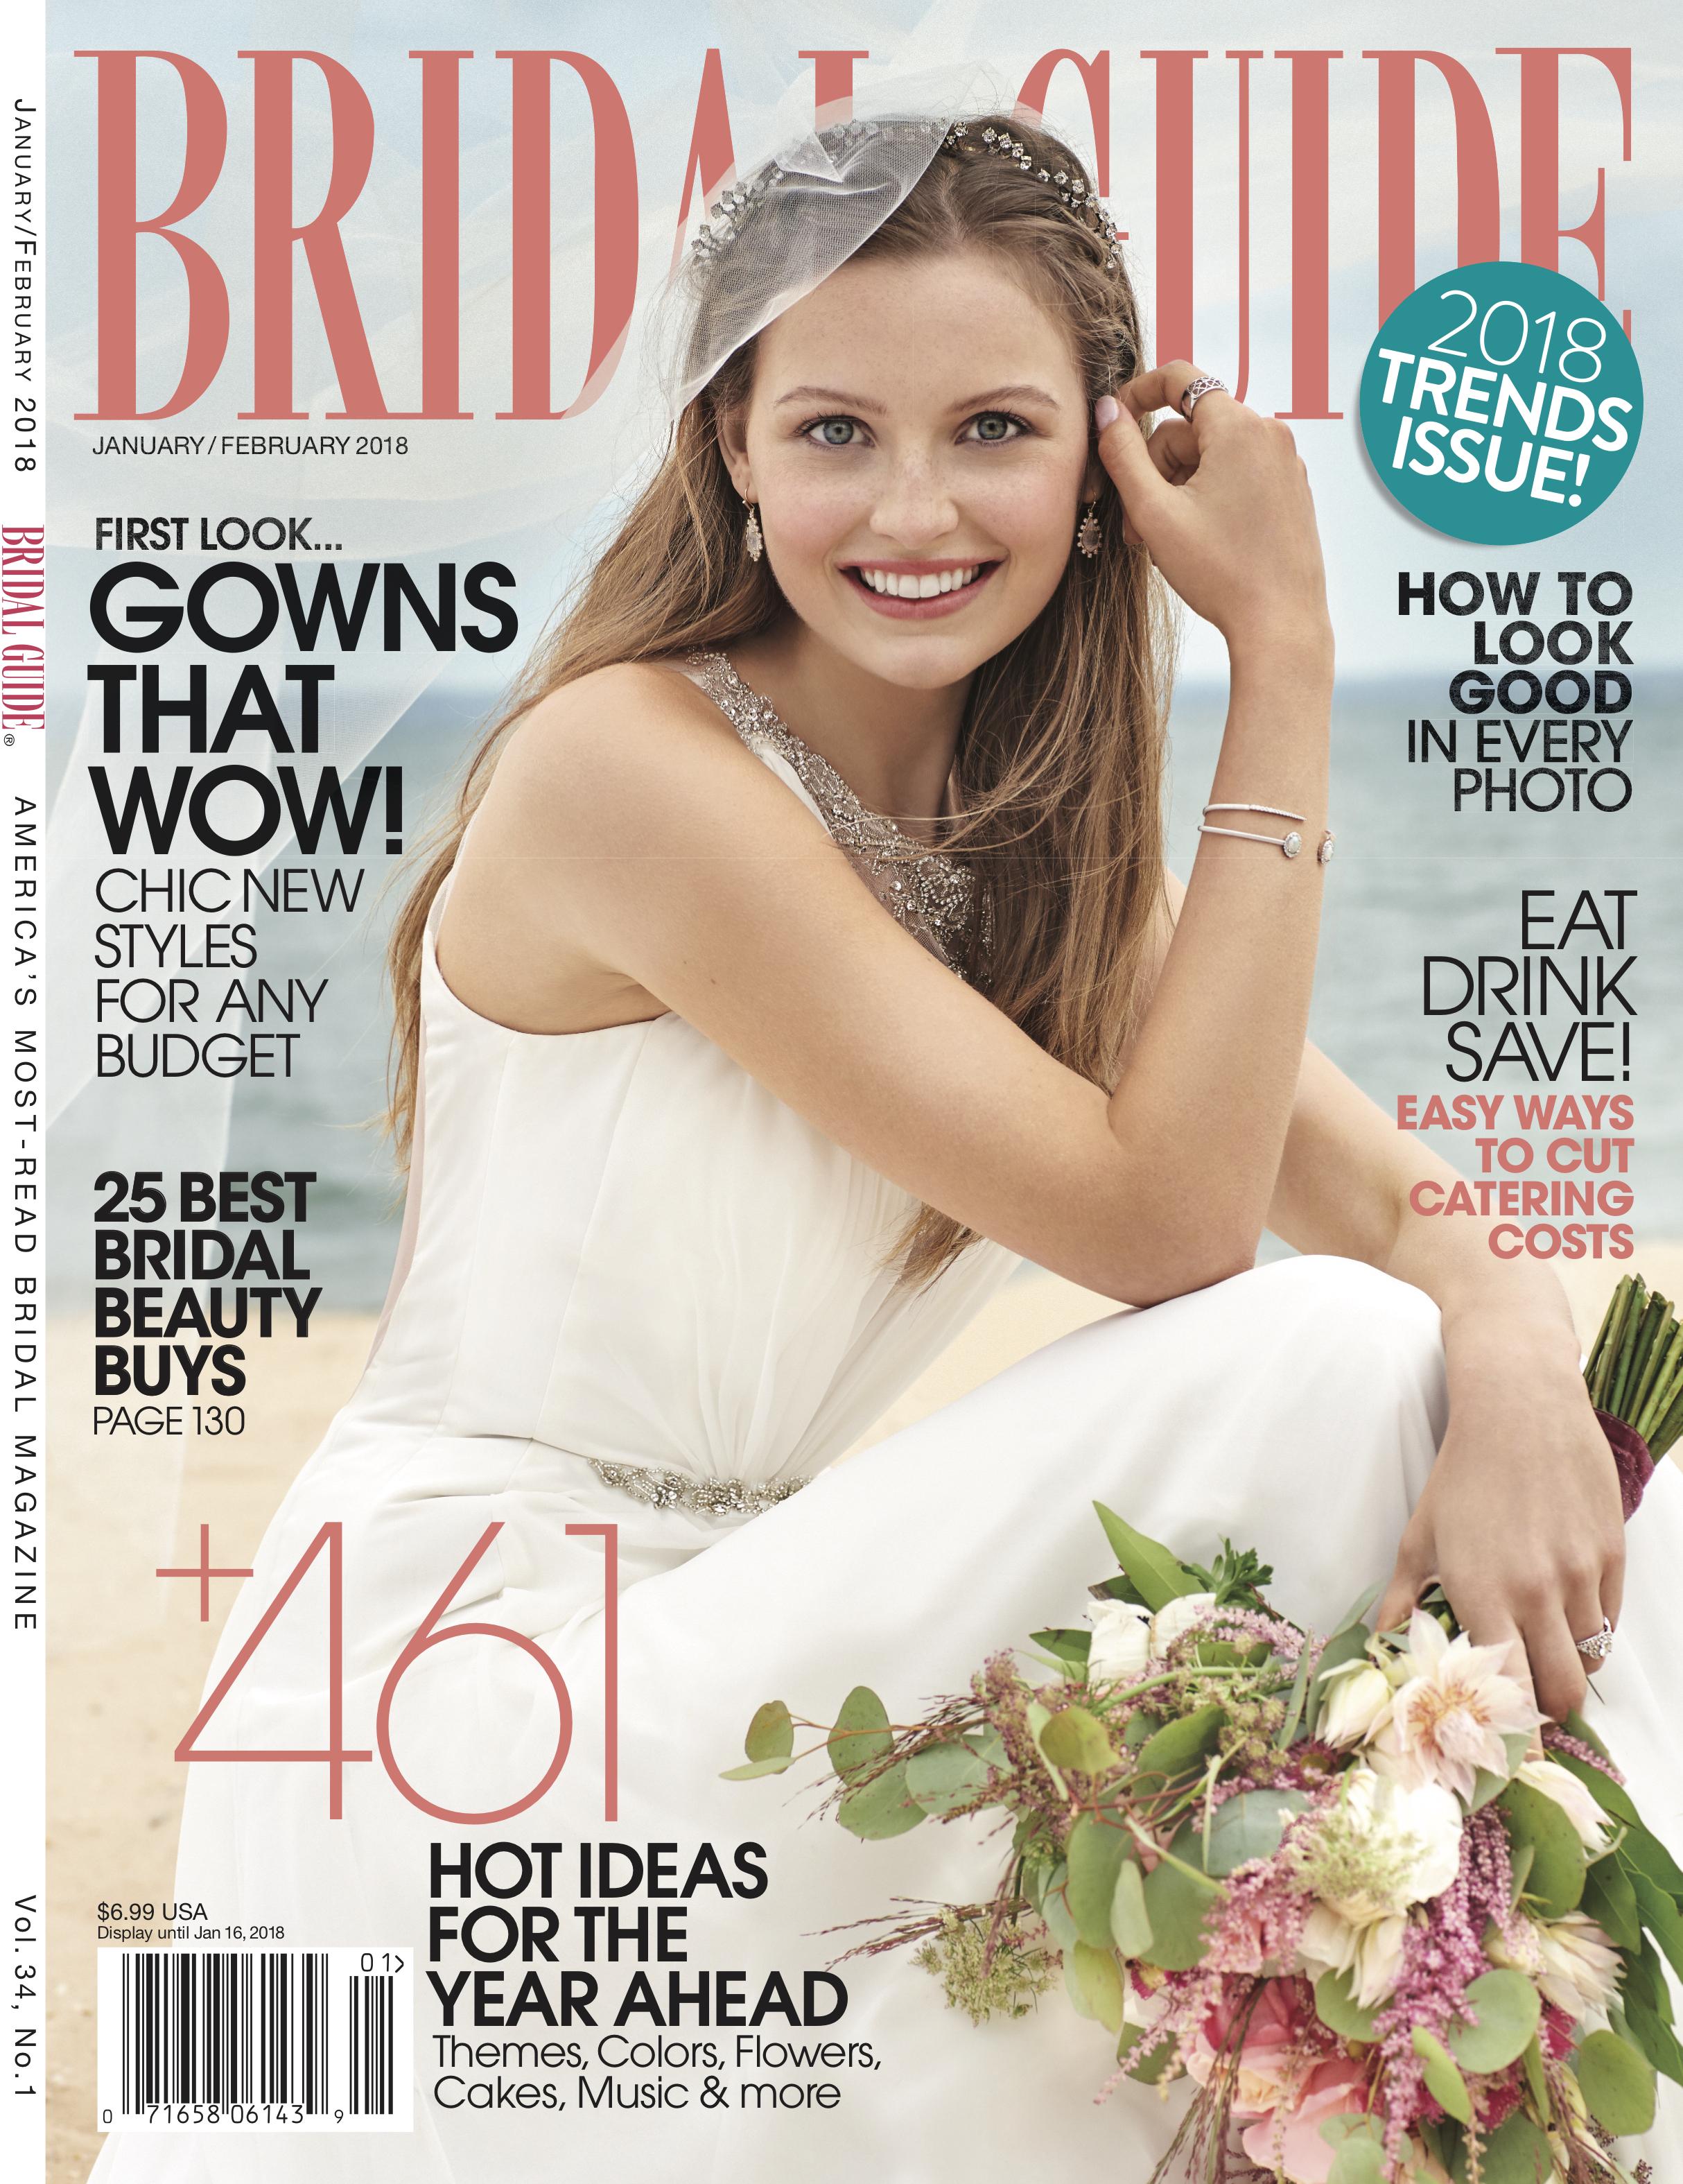 Bridal Guide wedding magazine.jpg